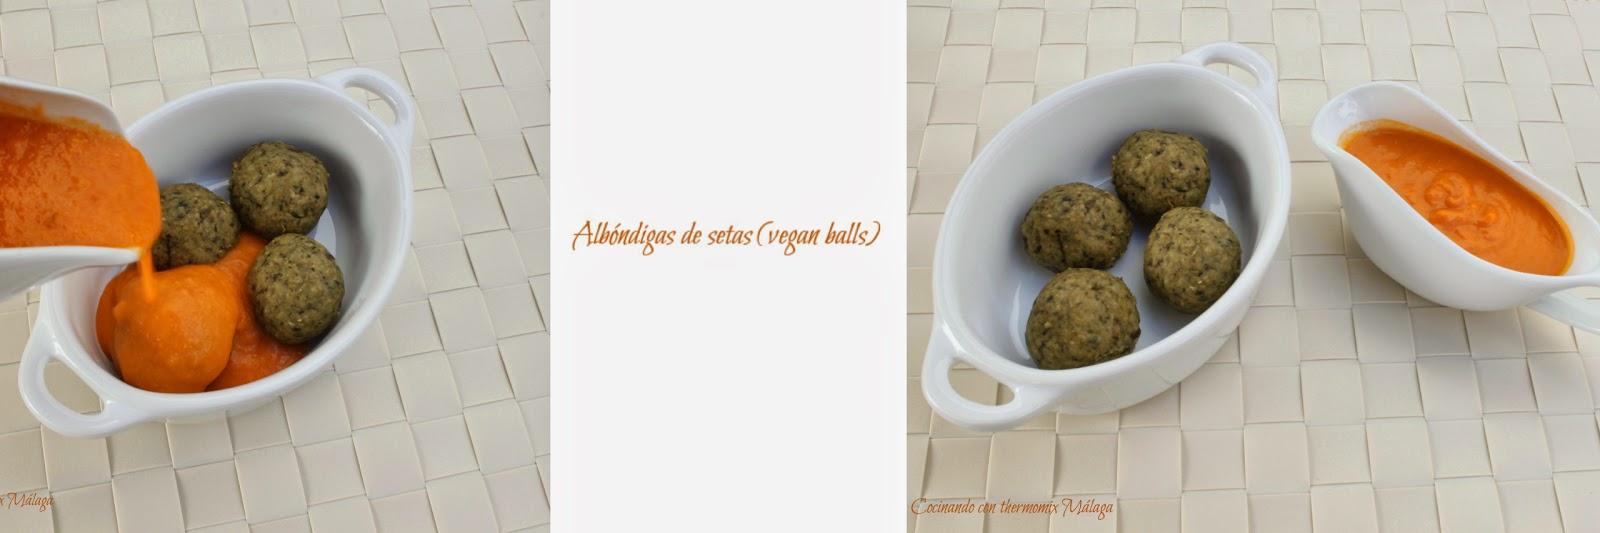 Albóndigas de setas (vegan balls)